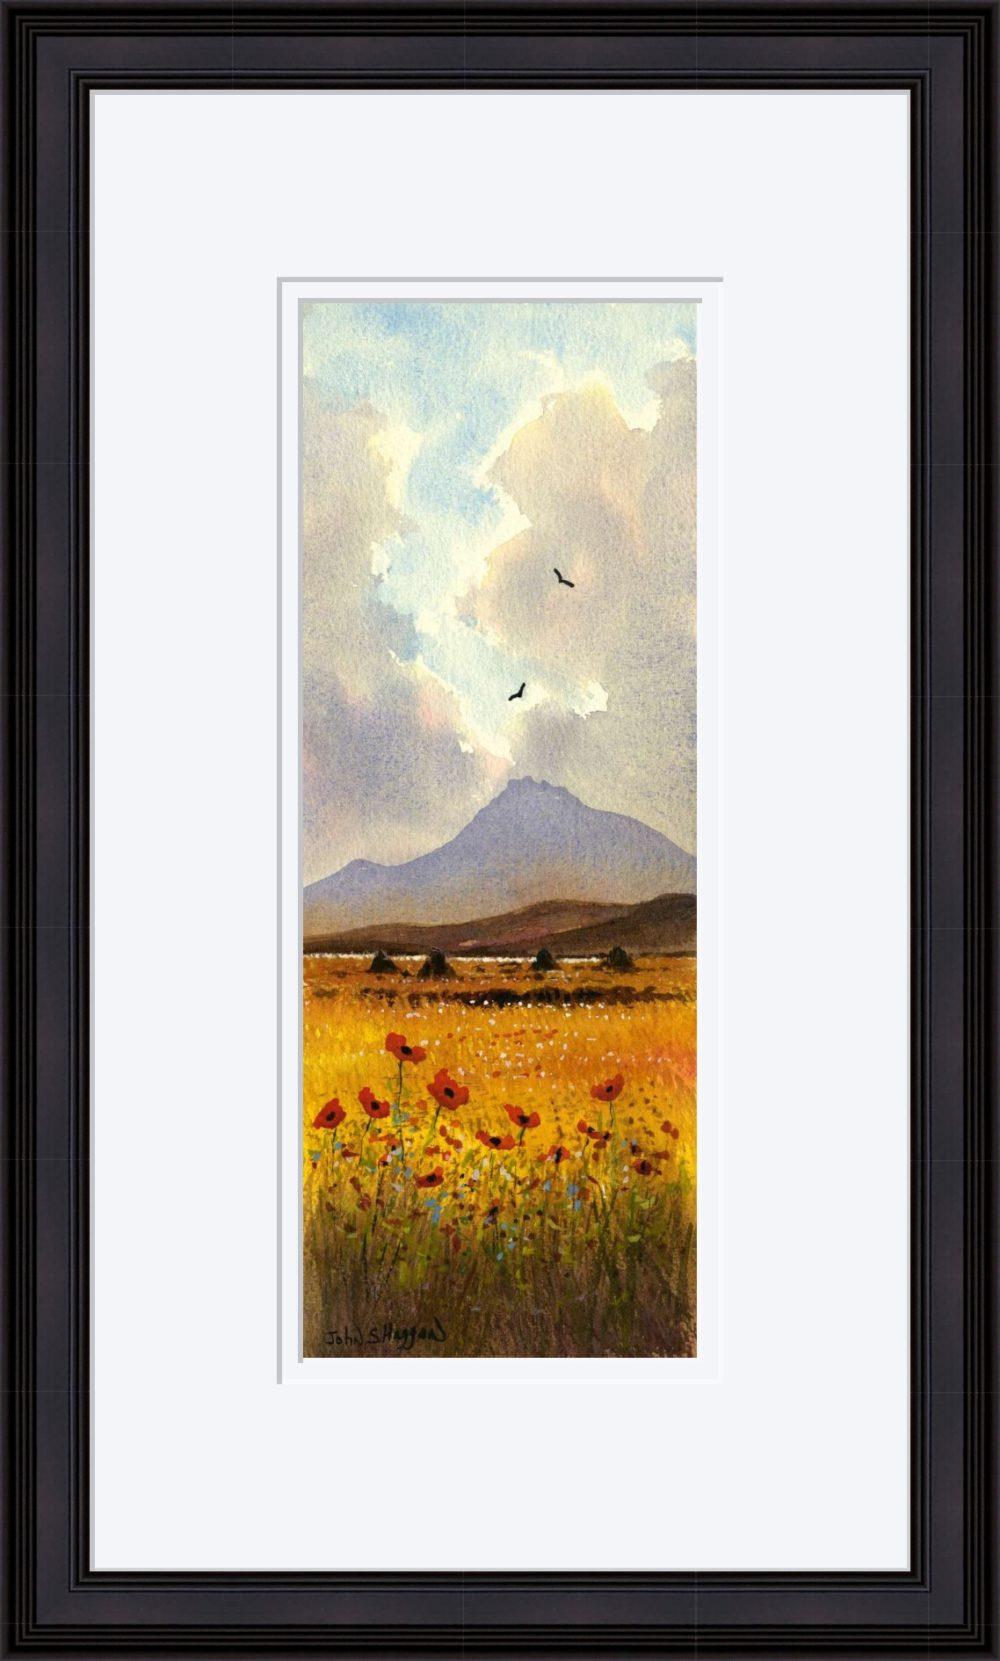 Connemara Poppies Print in Black Frame